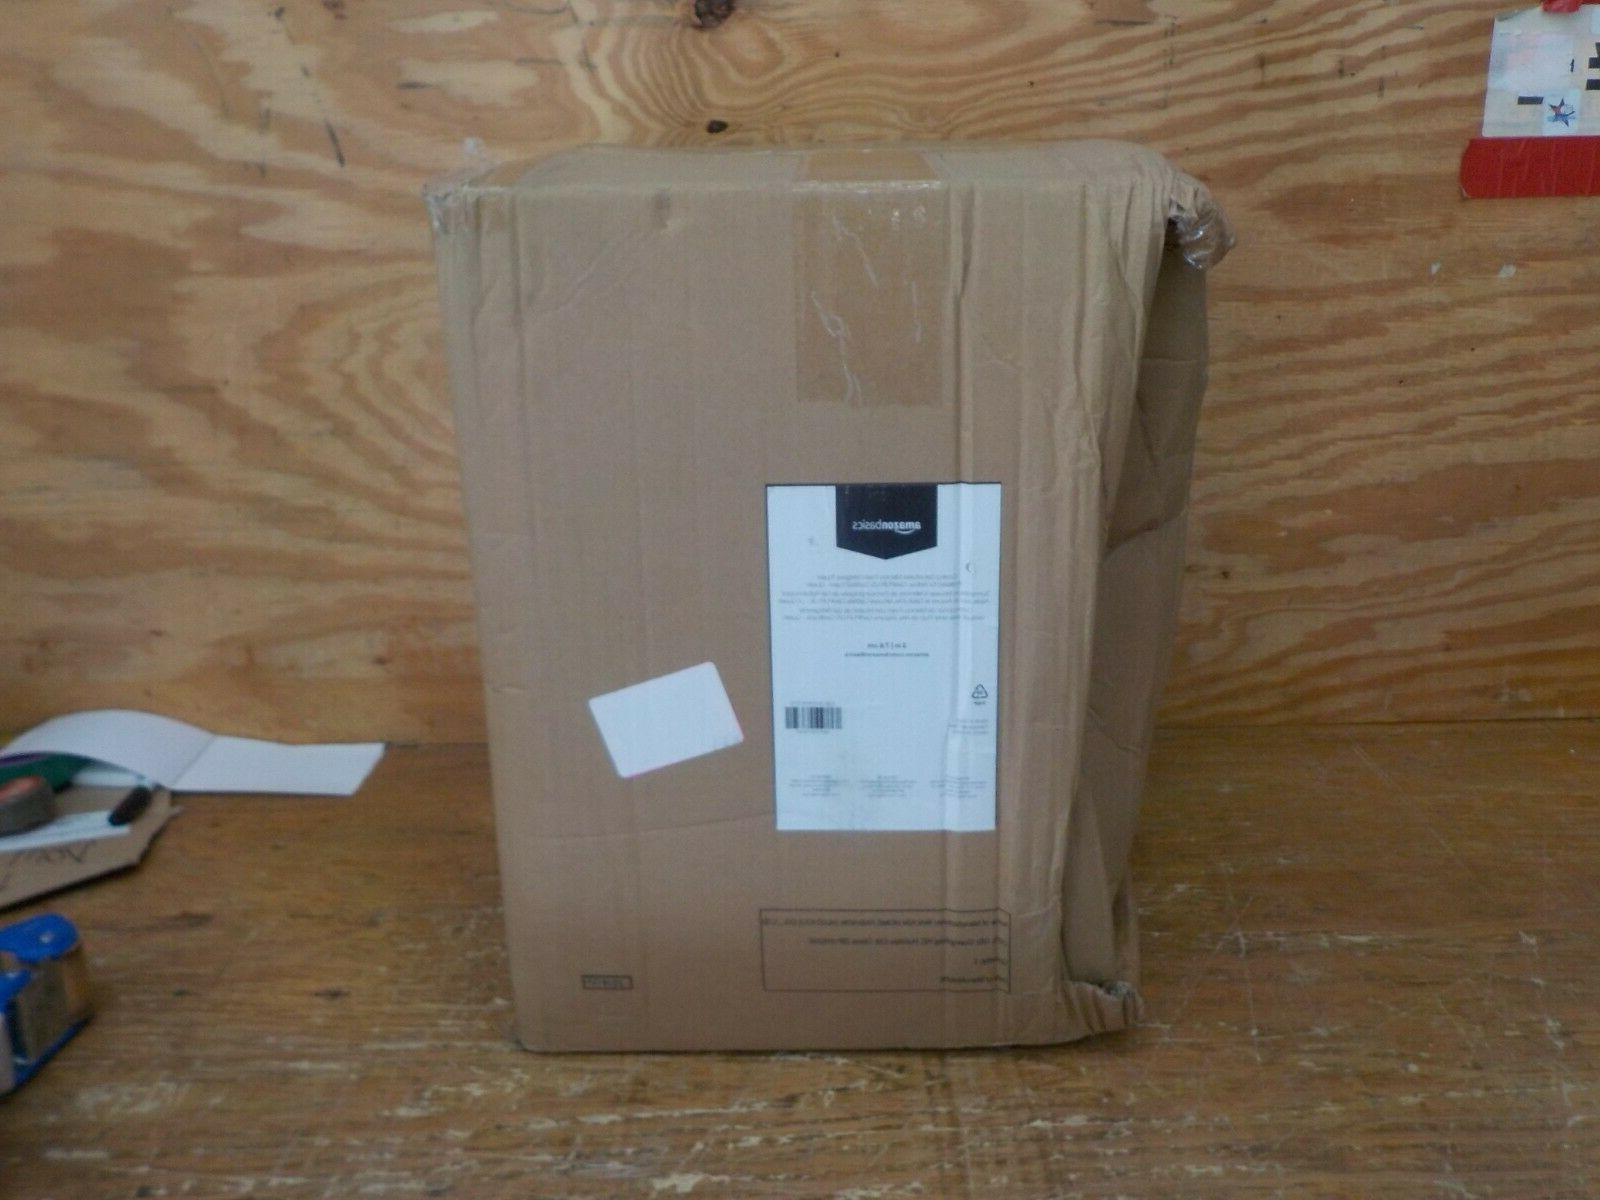 AmazonBasics Gel-Infused Foam Mattress Topper - Ventilated, Certi